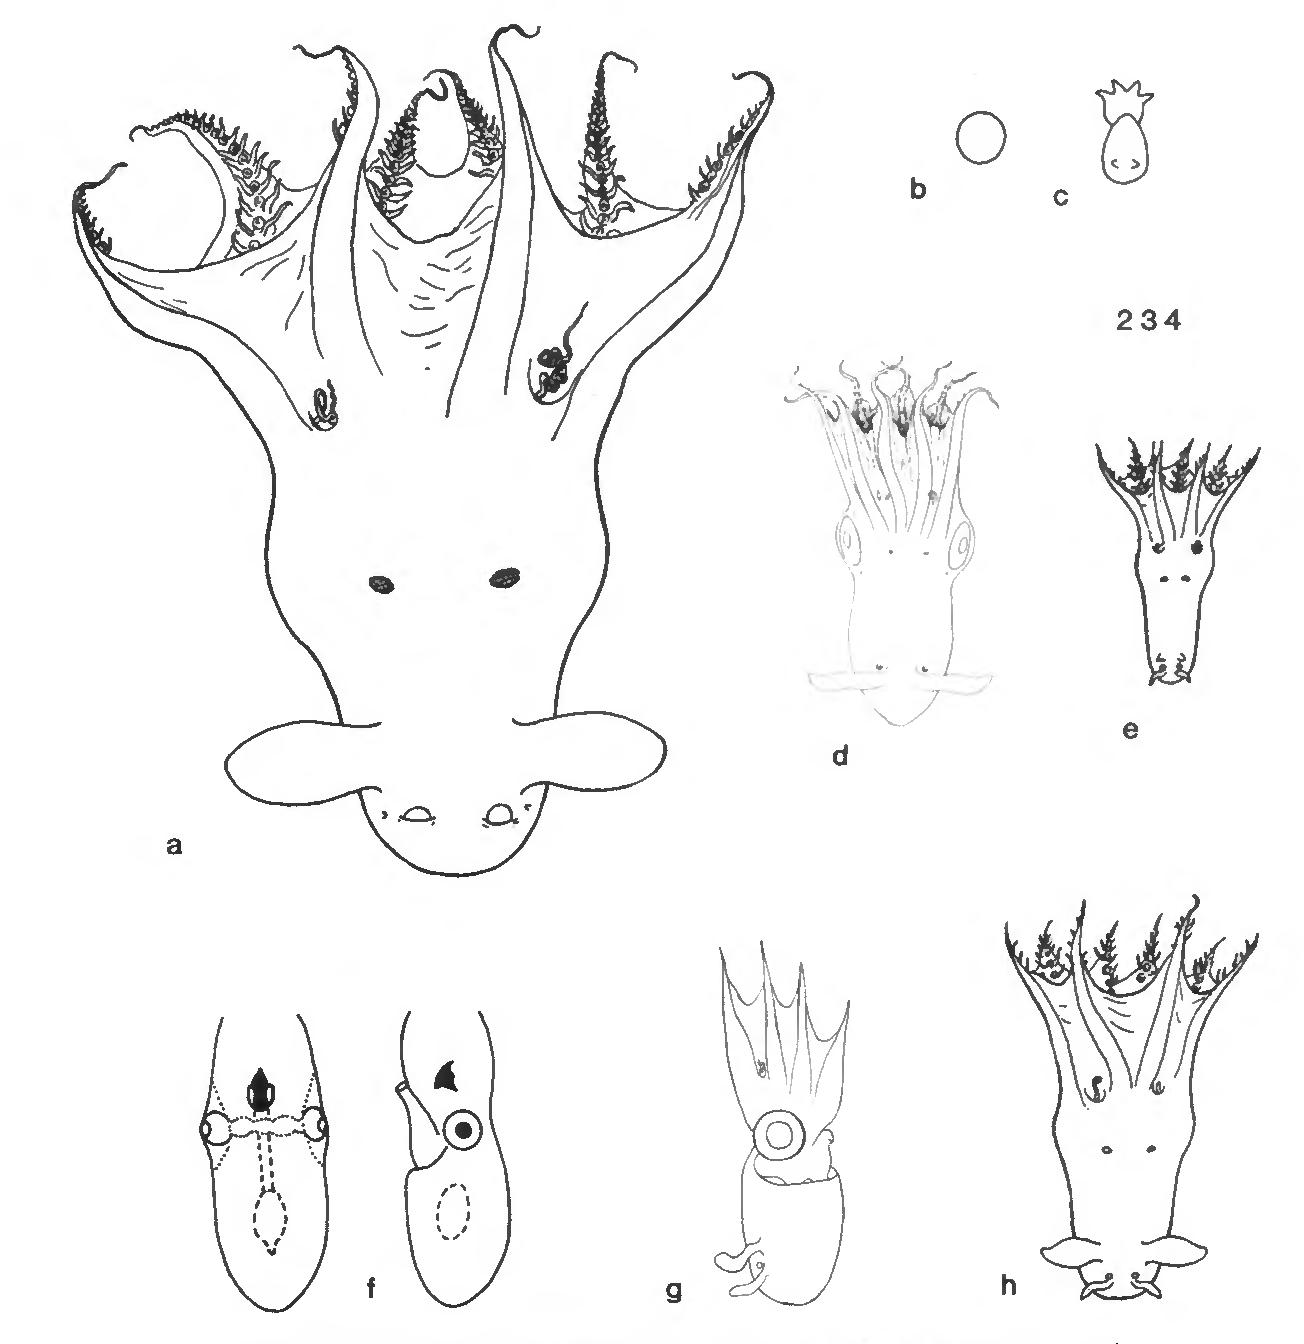 figure 234